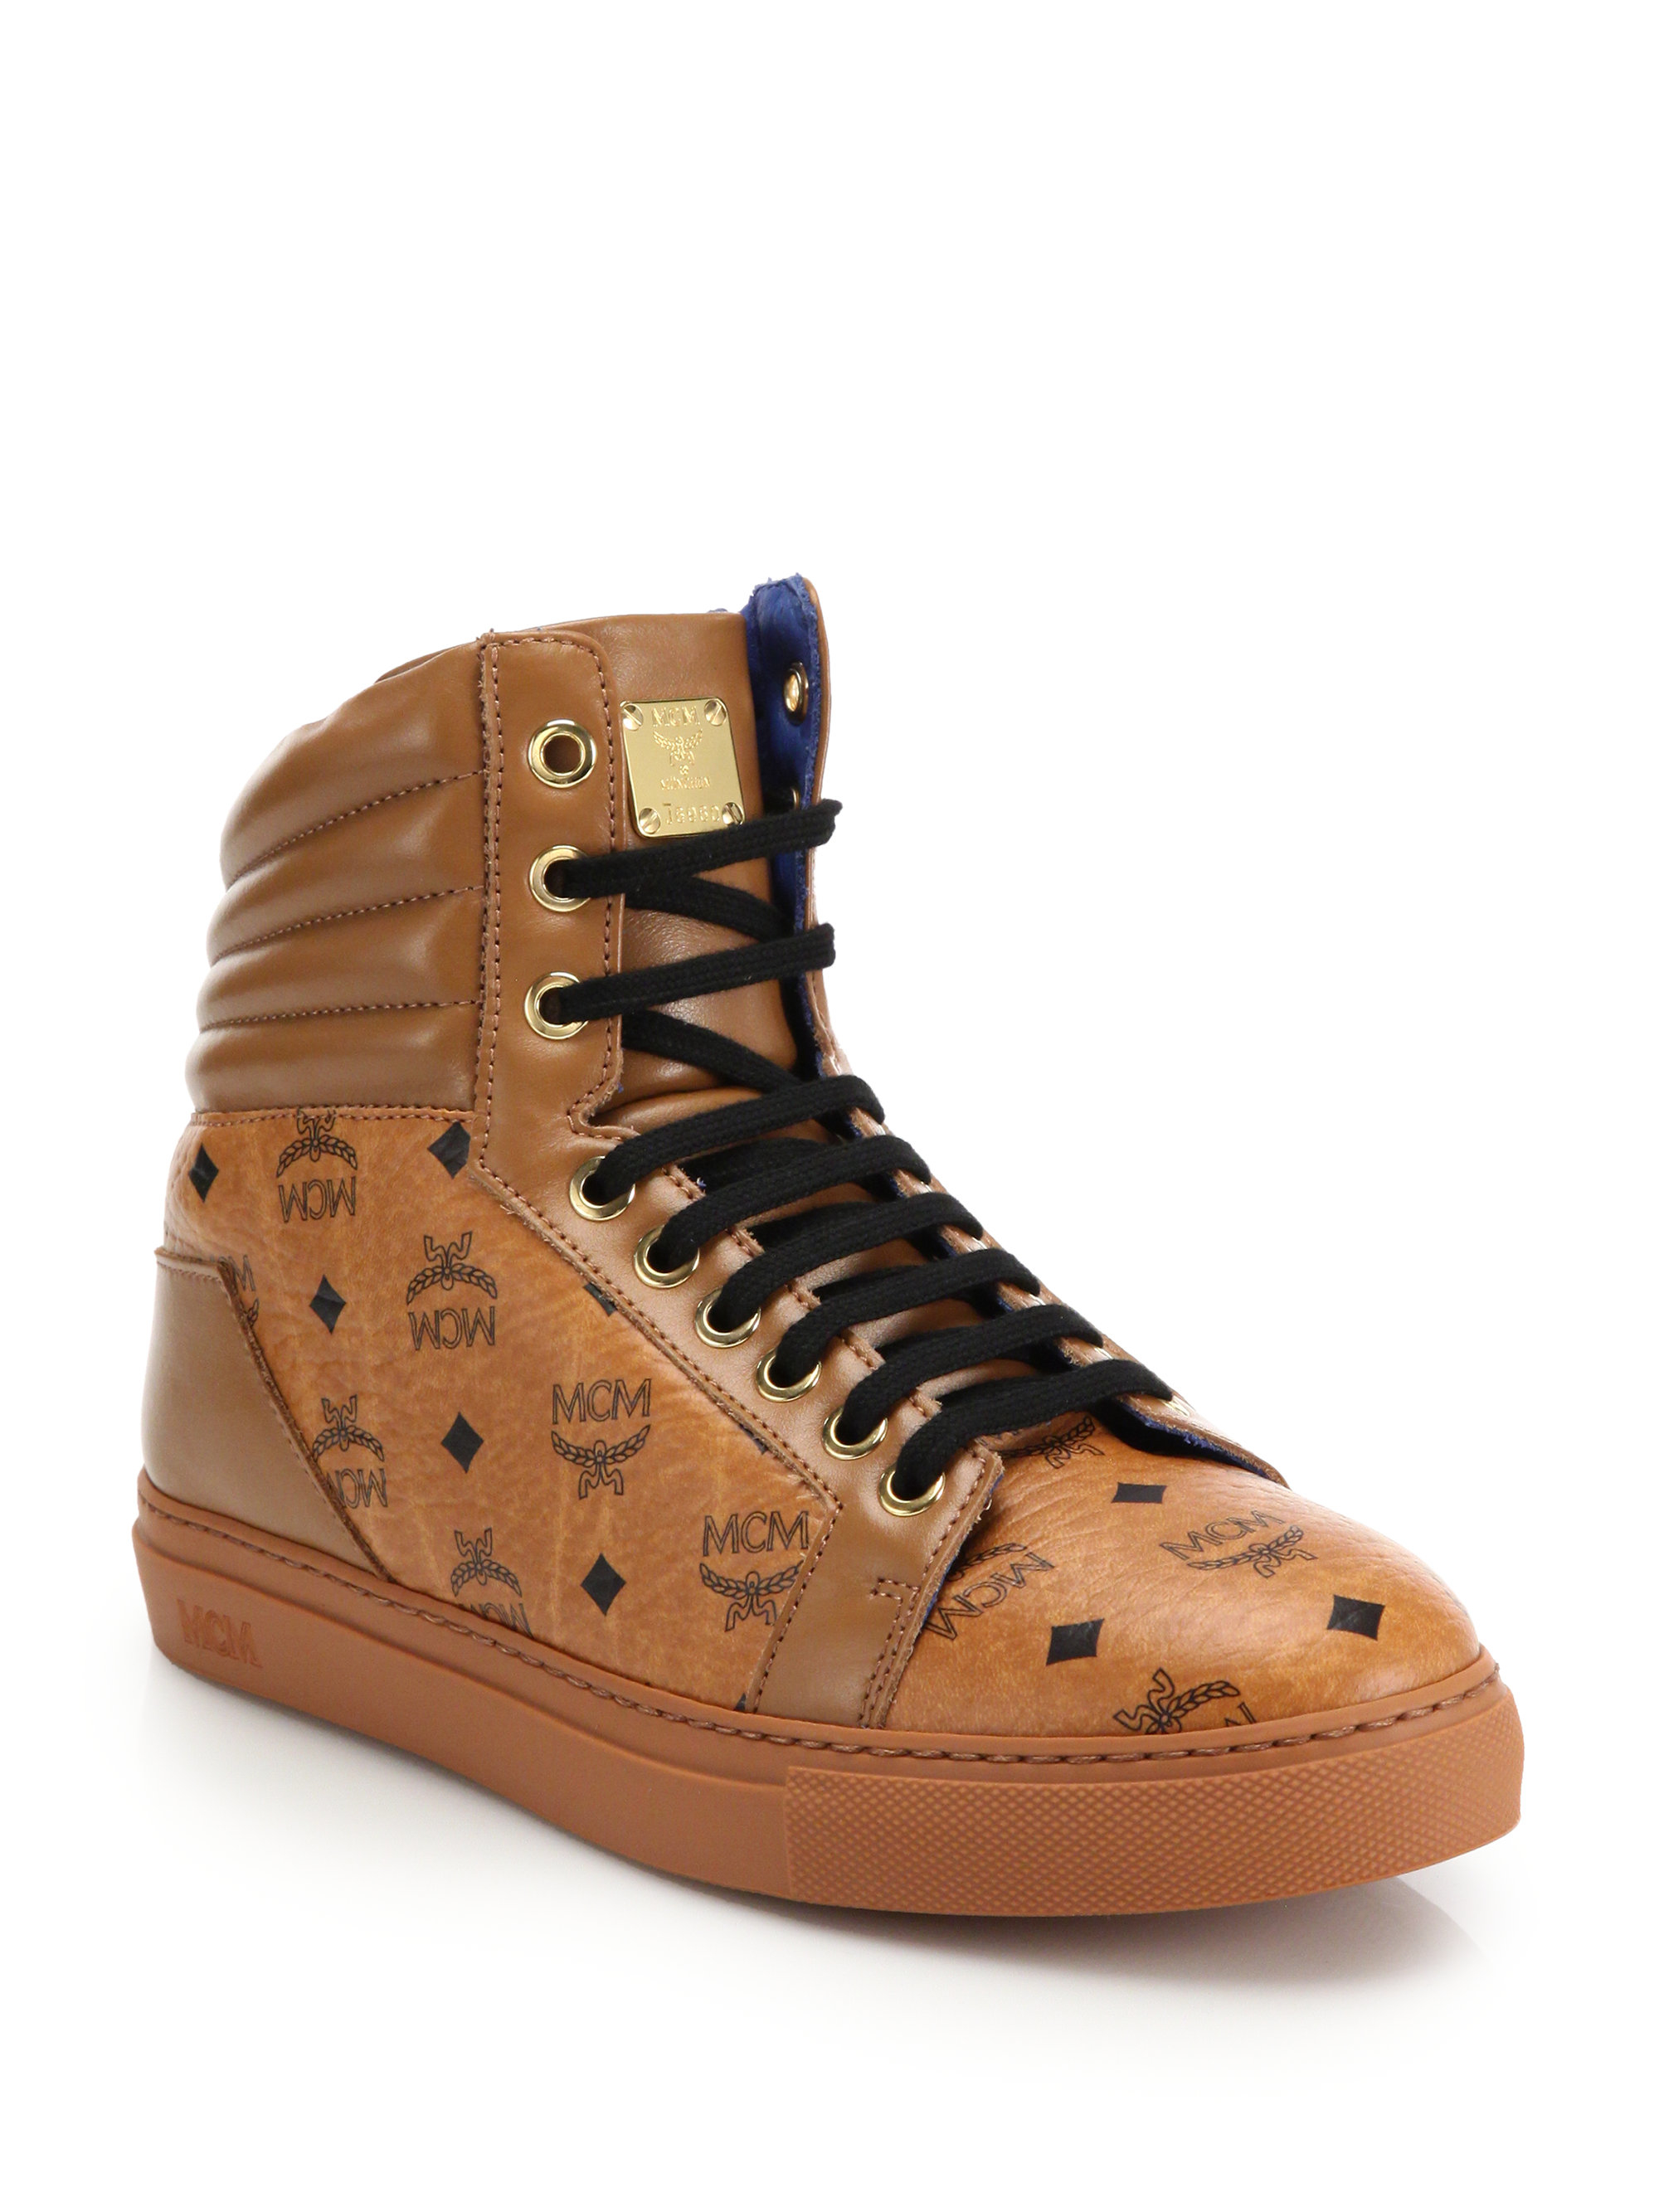 Mcm Womens Shoes